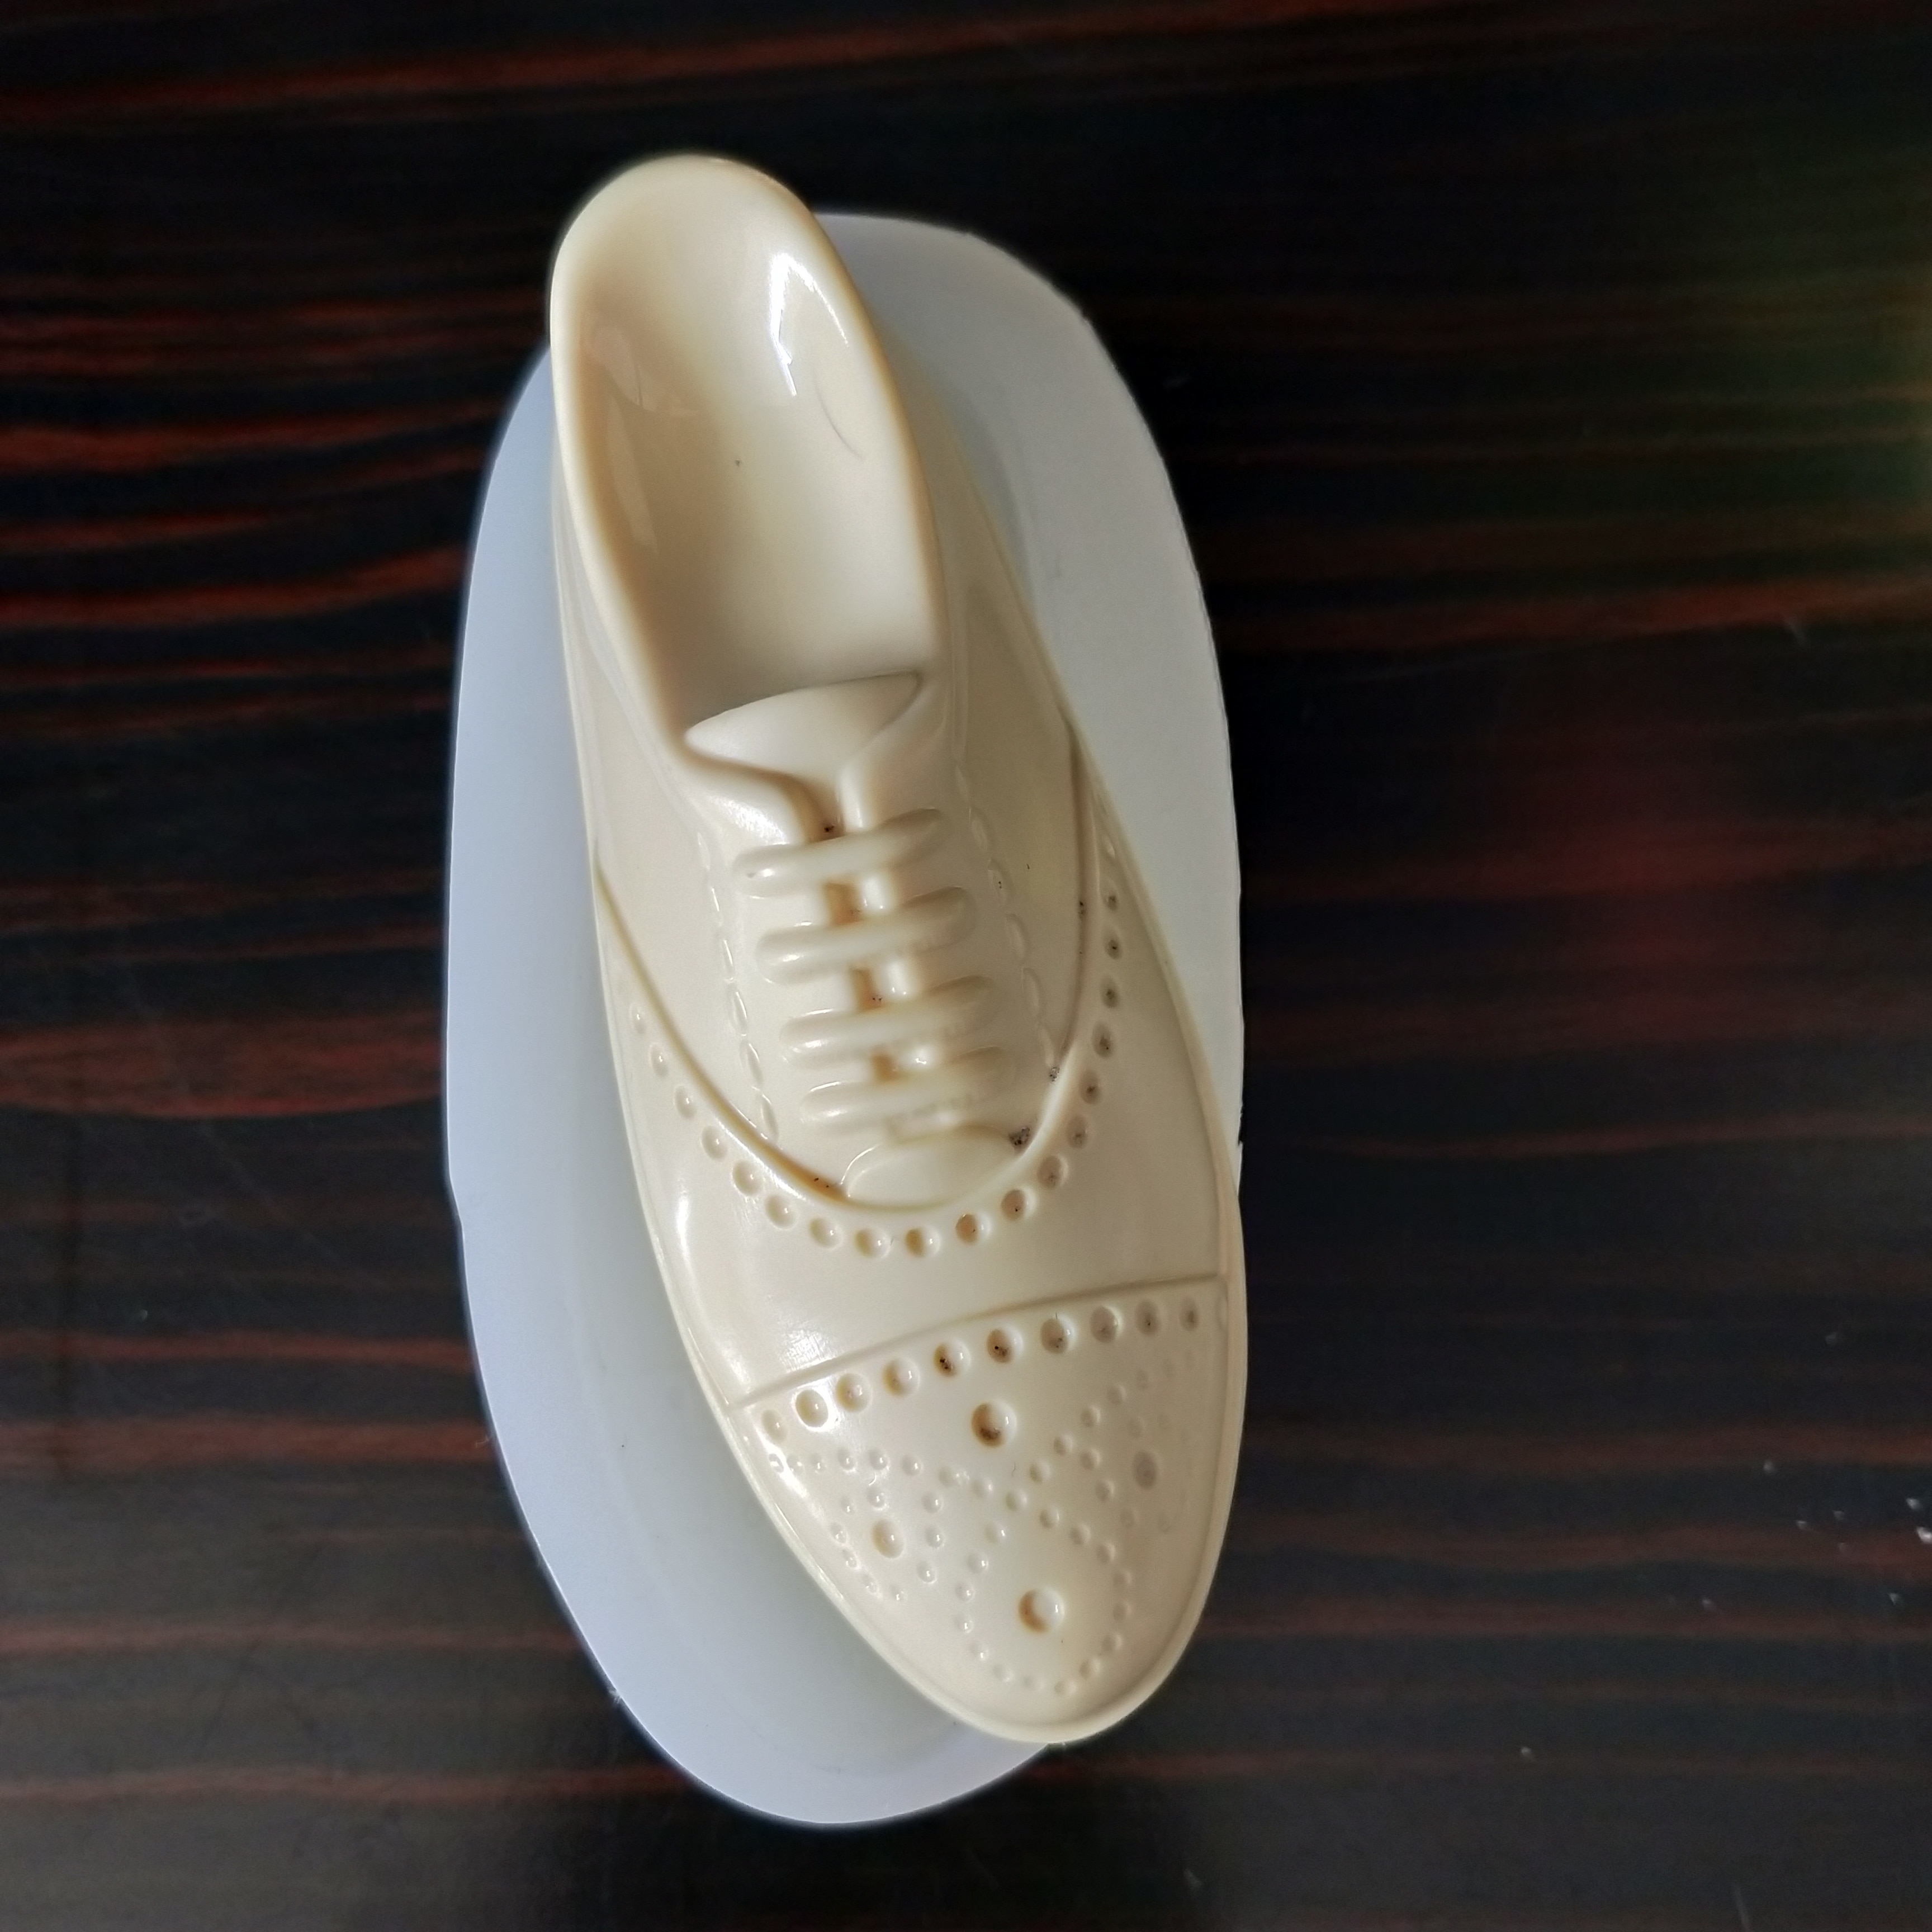 Molde de silicona QT0218 PRZY, moldes de jabón con forma de zapato de cuero, moldes para velas de Chocolate y yeso, molde de Fondant para zapatos, resina de arcilla, goma de silicona